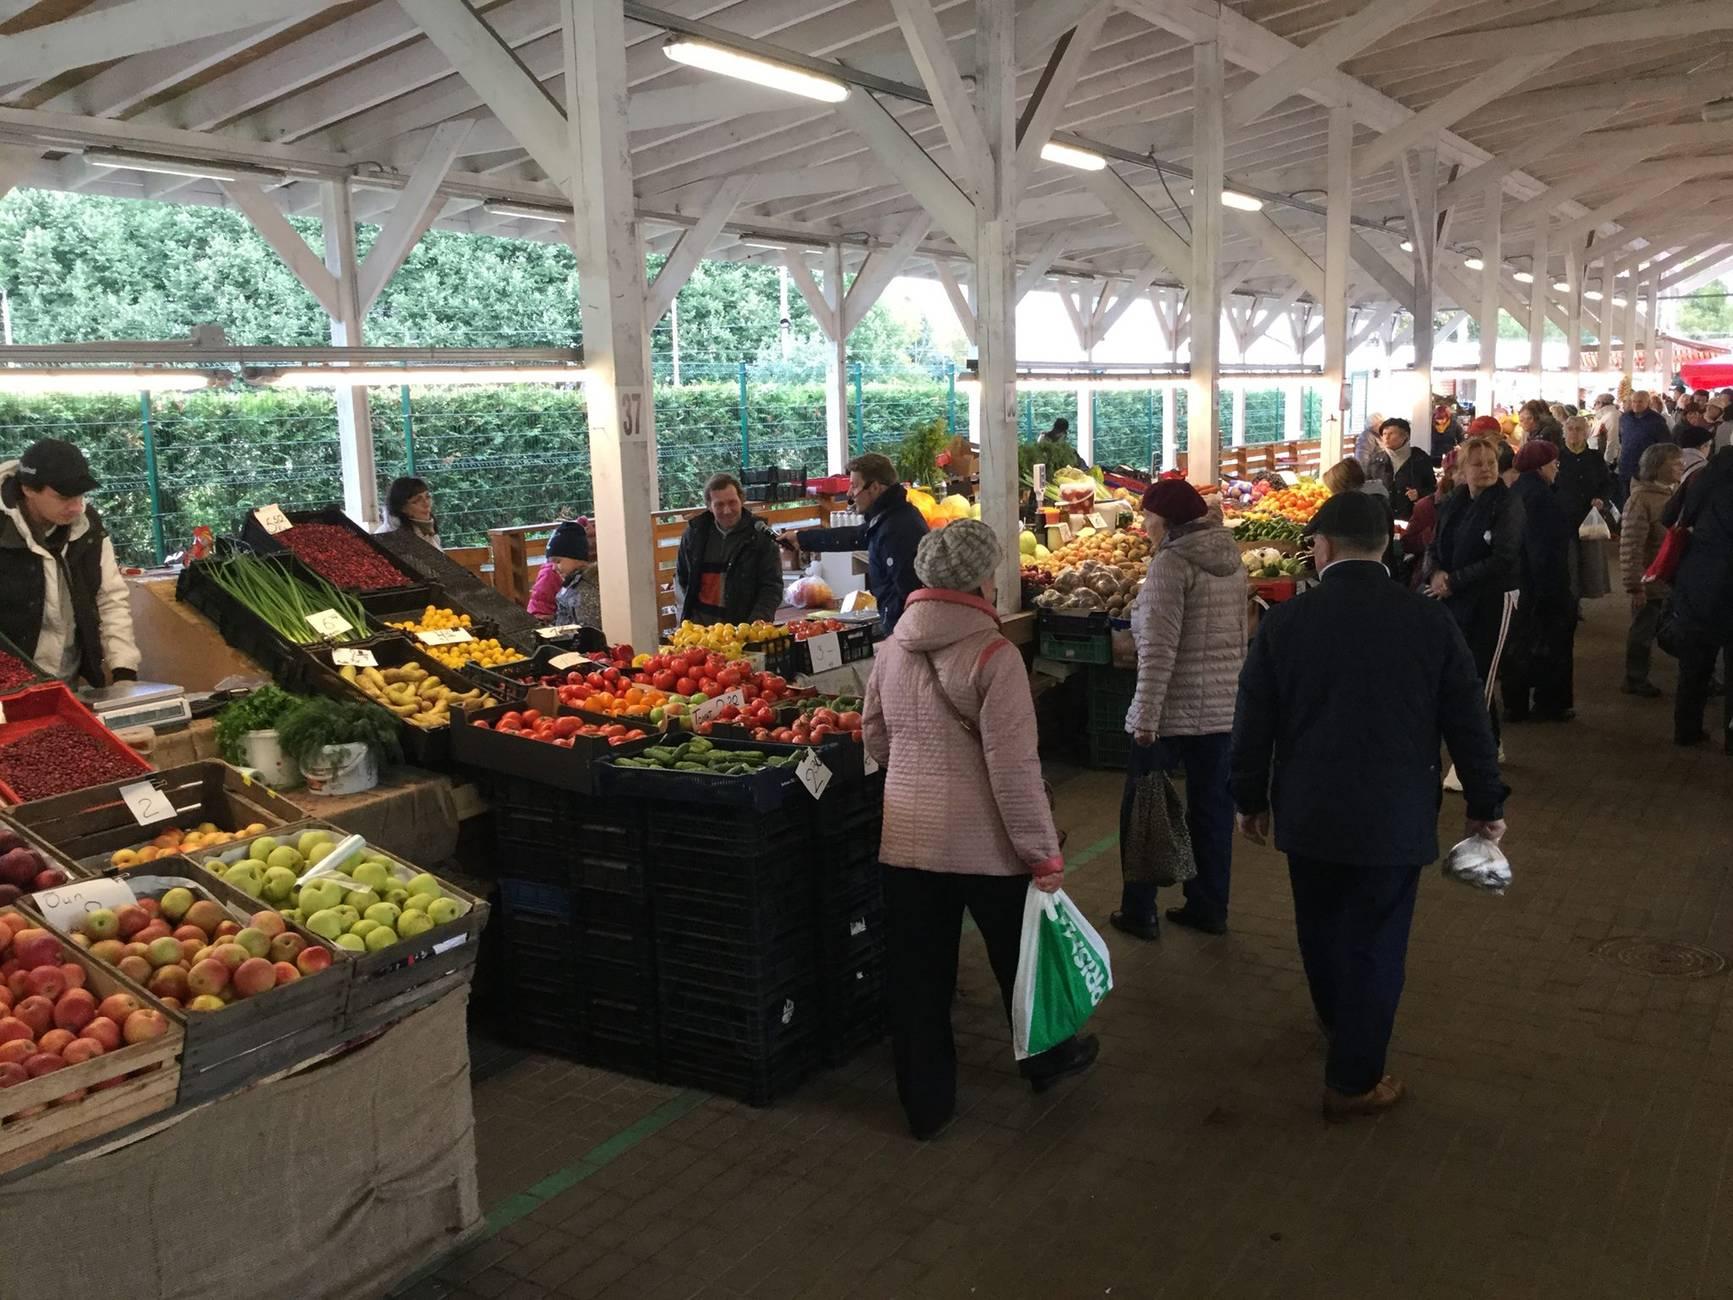 Mustamäe market in Tallinn,Estonia